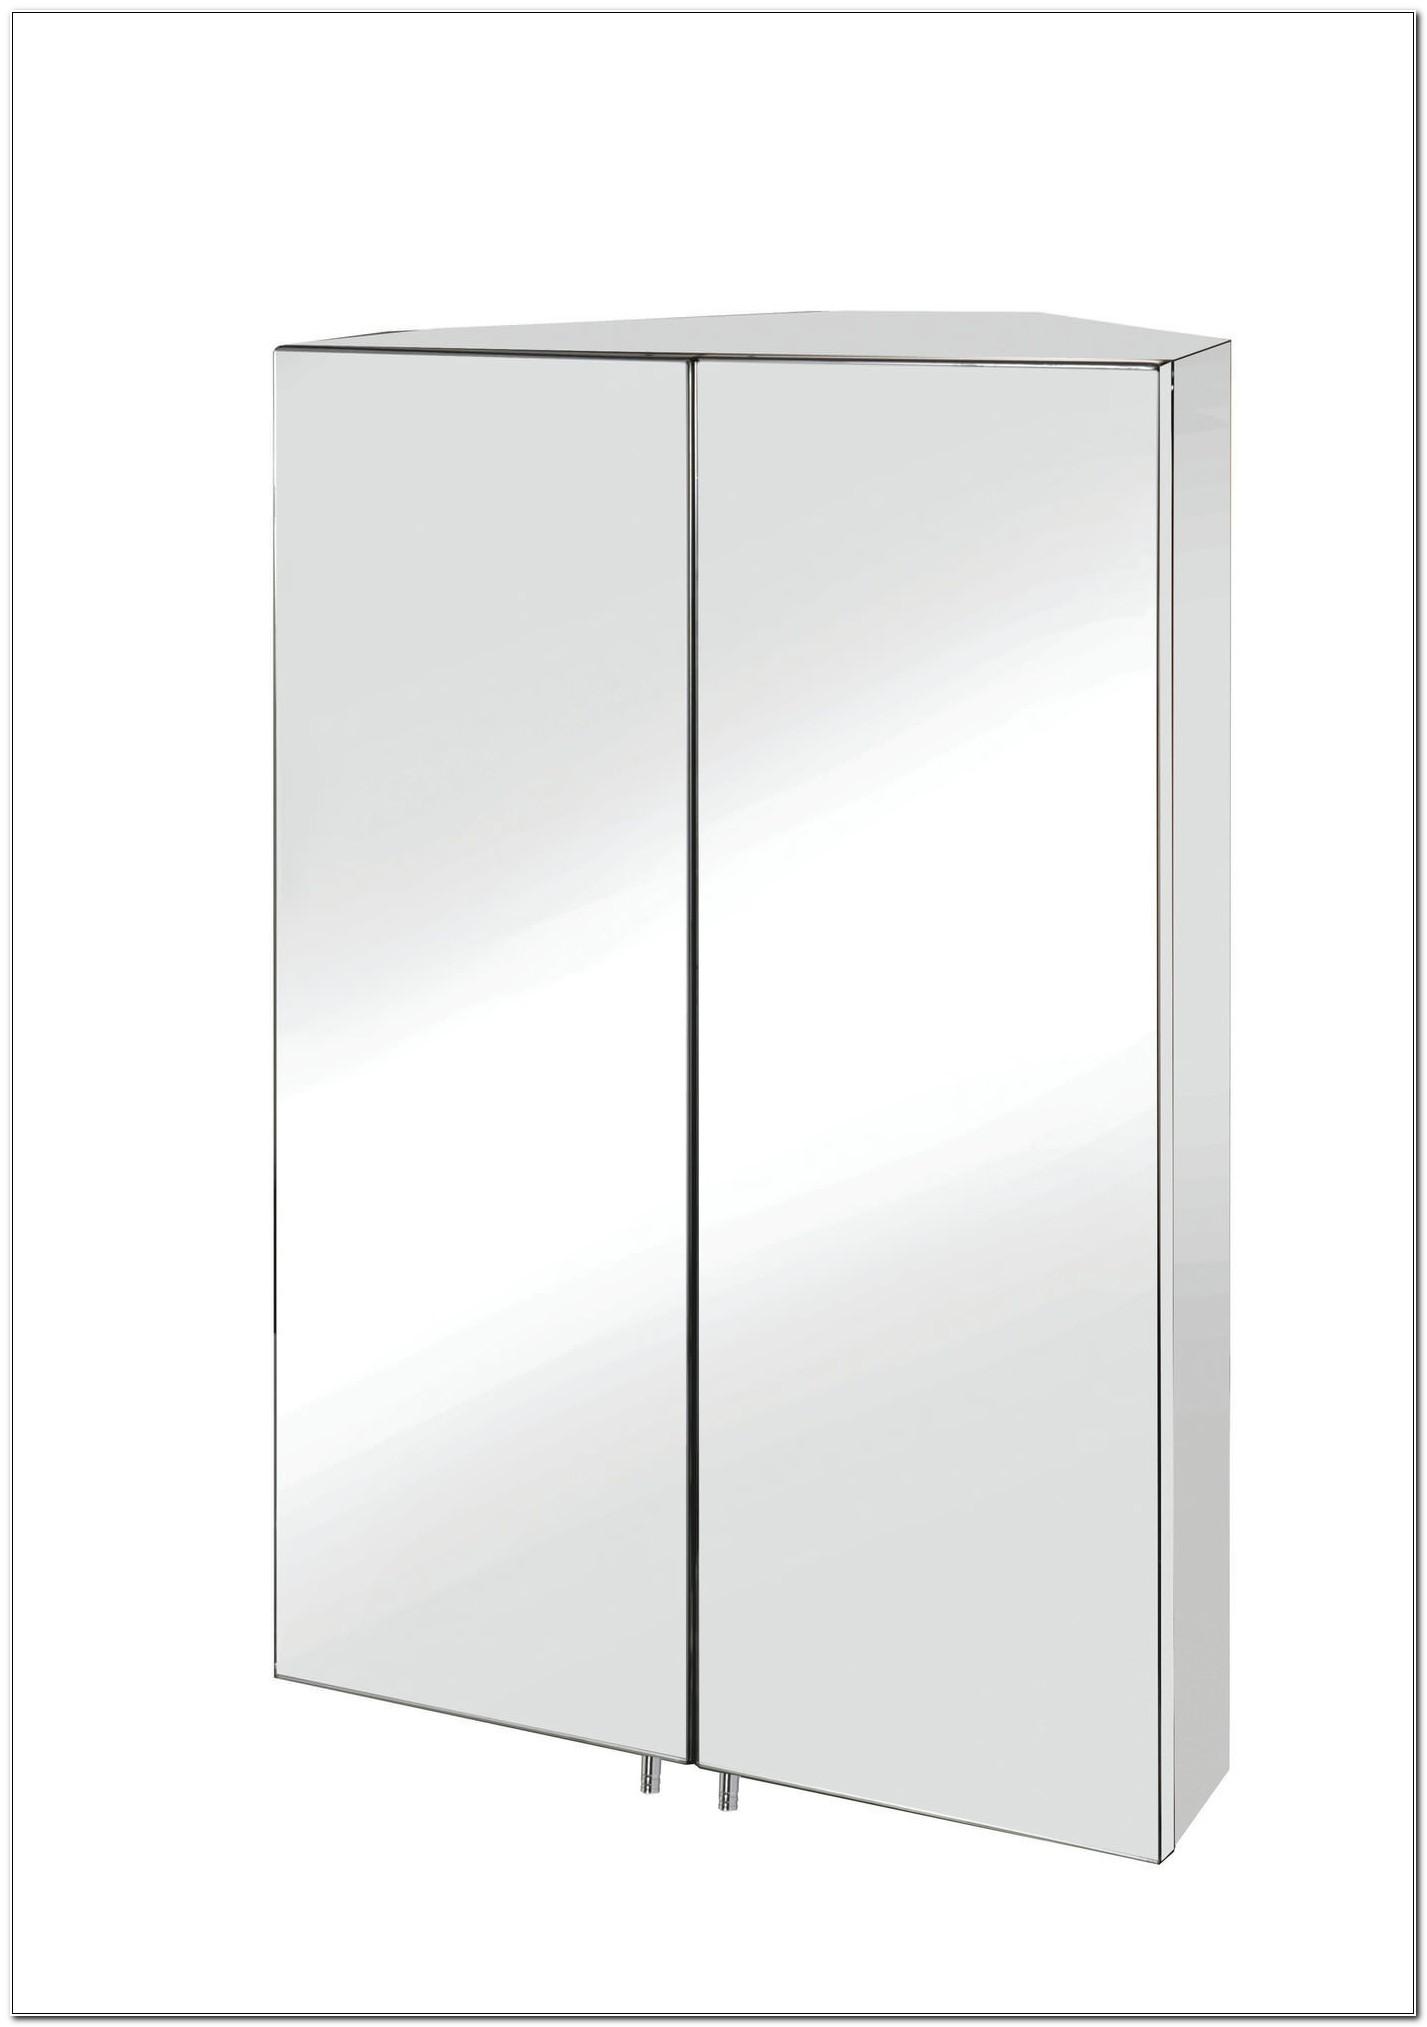 Double Mirrored Corner Bathroom Cabinet